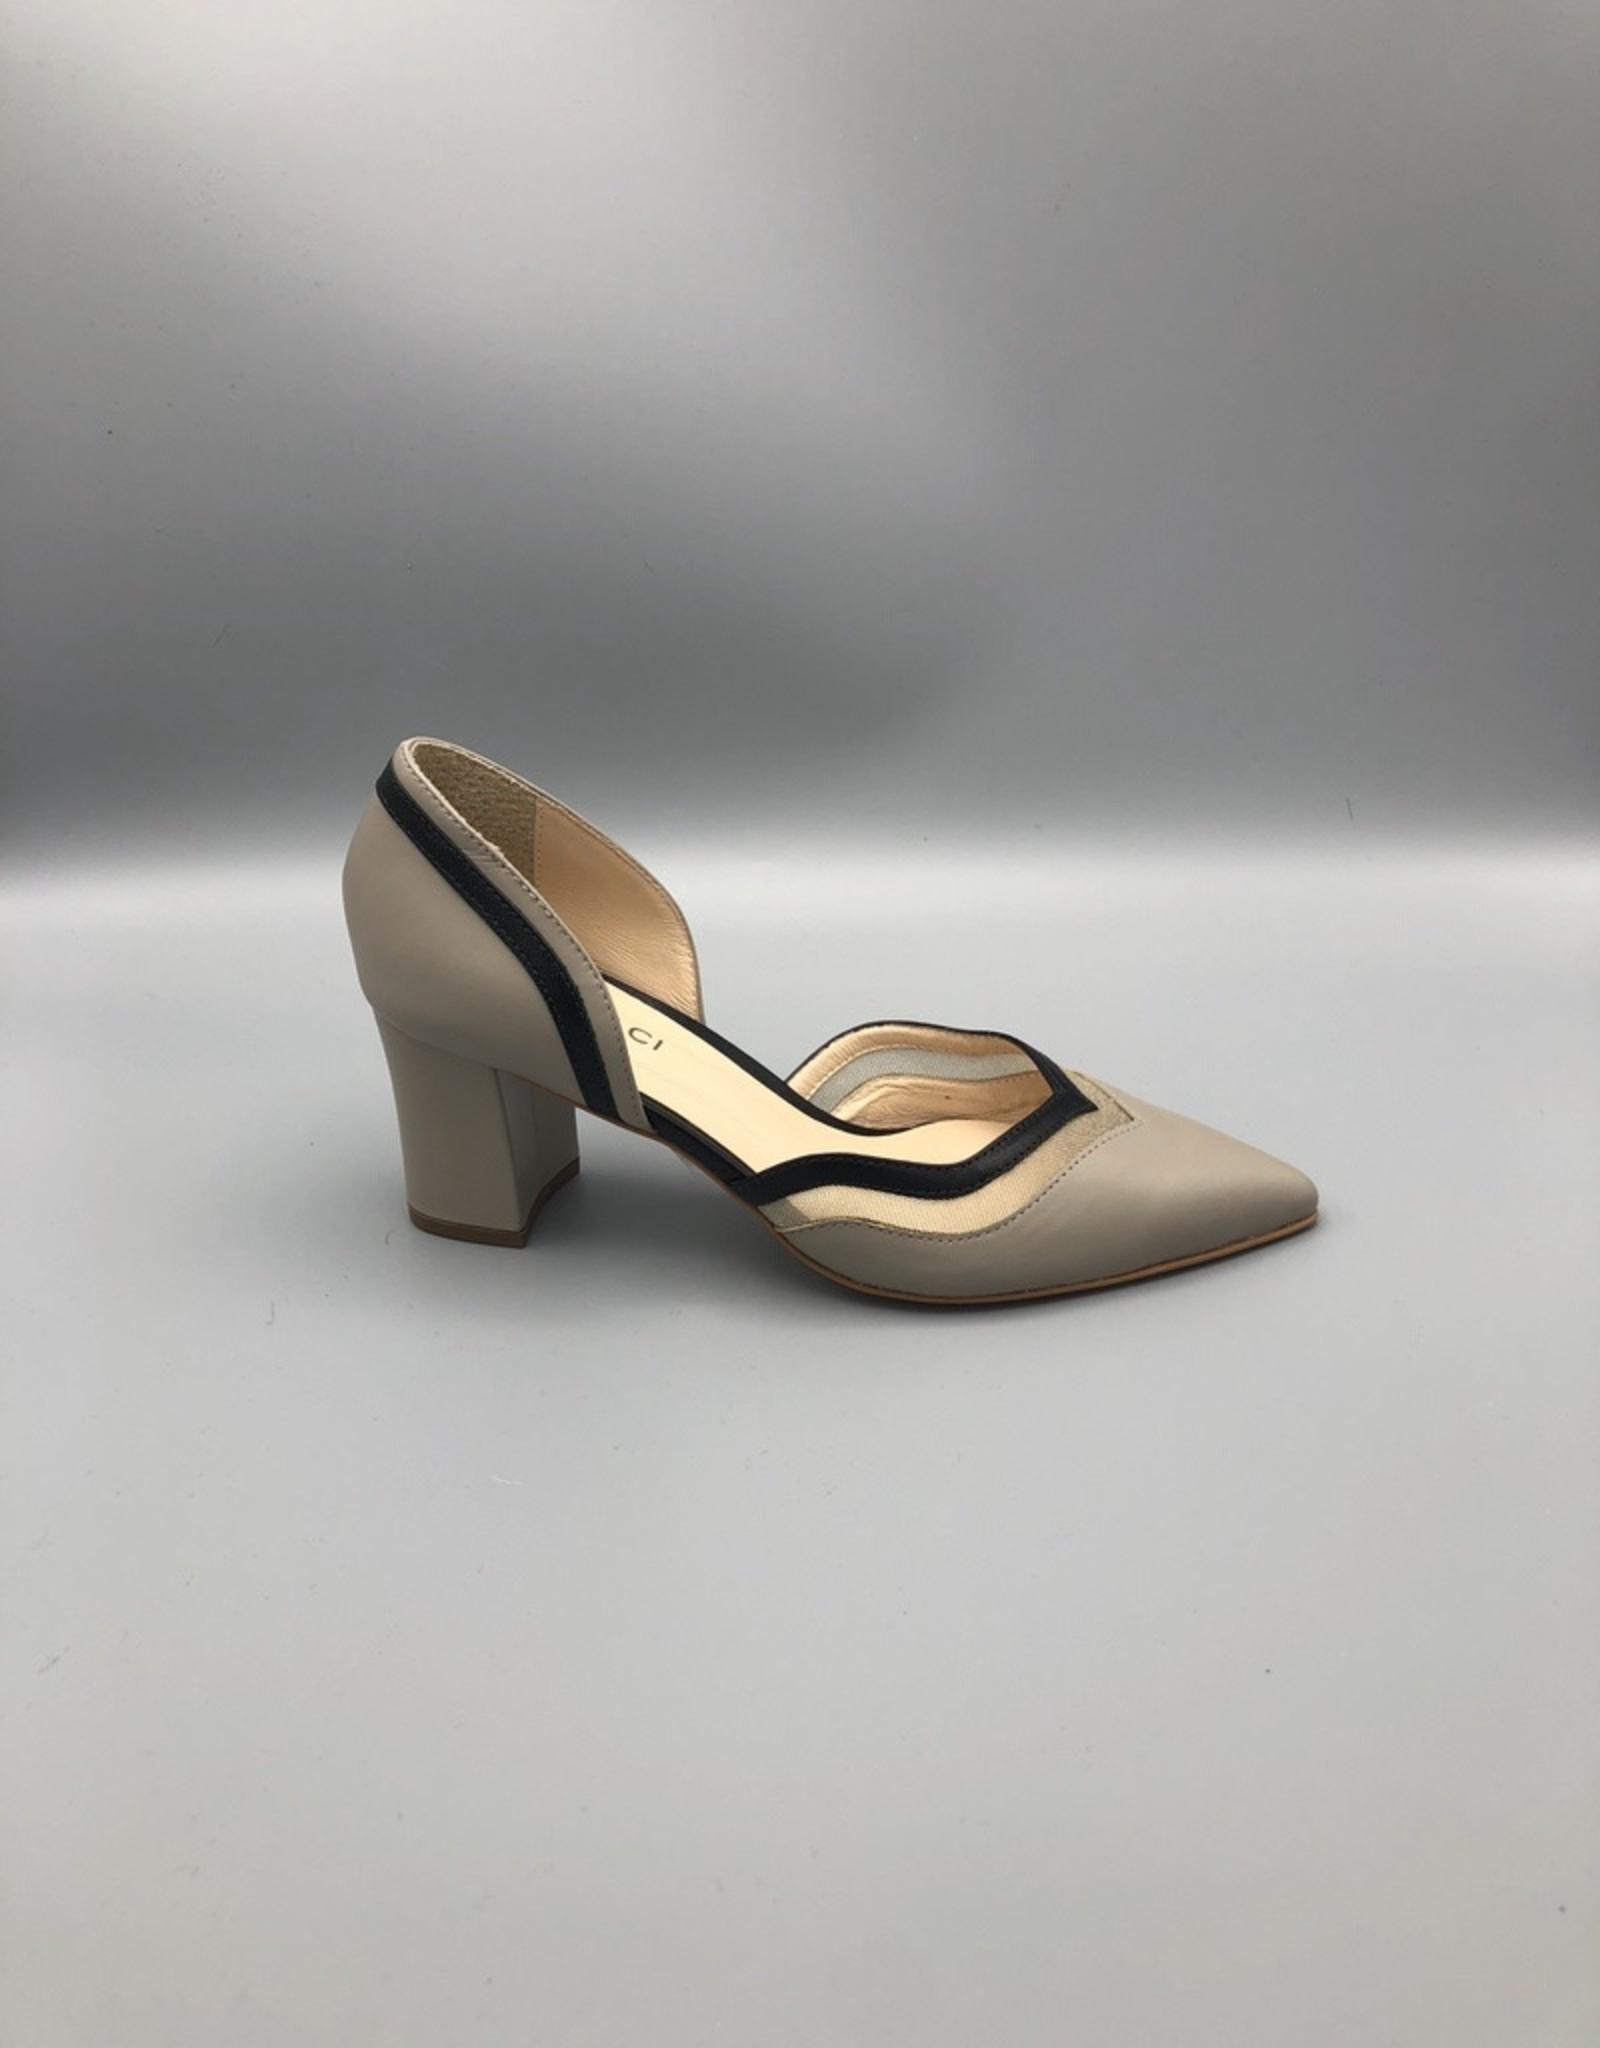 Lorraci Pointed Toe Block Heel Mesh Pump